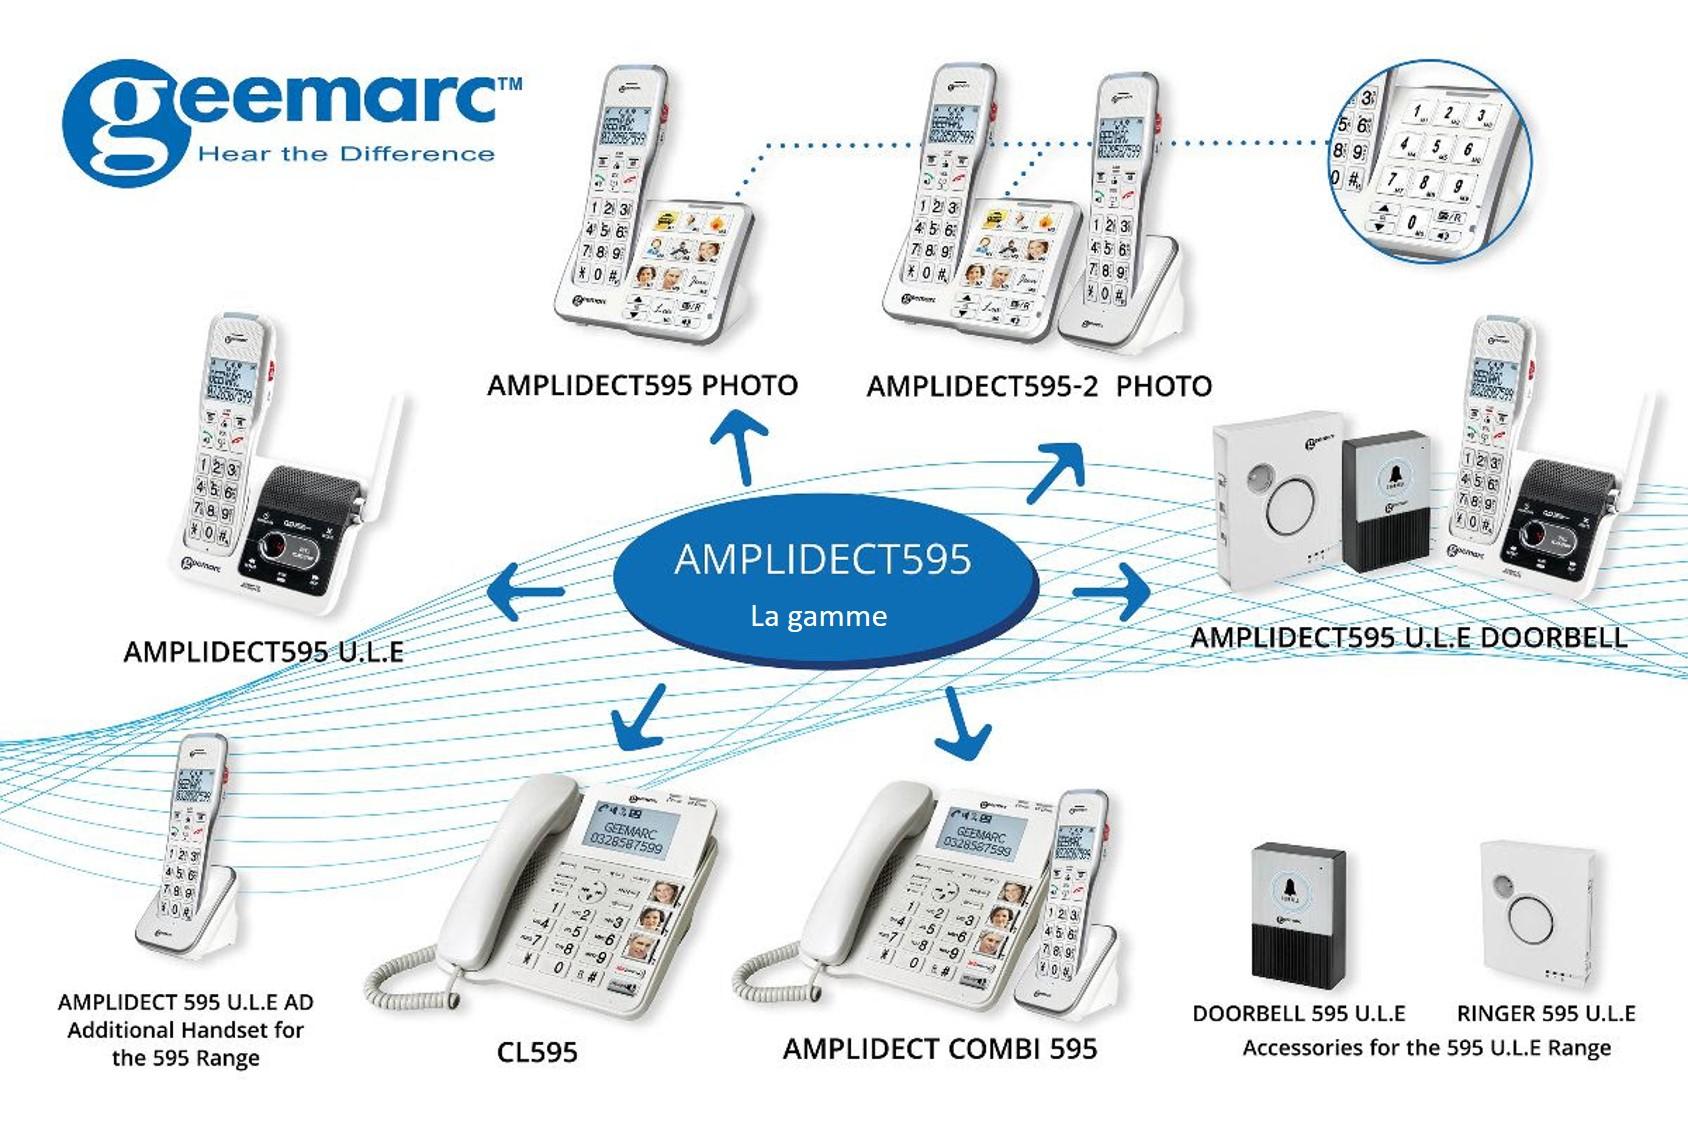 Amplidect 595 gamme - Bazile telecom